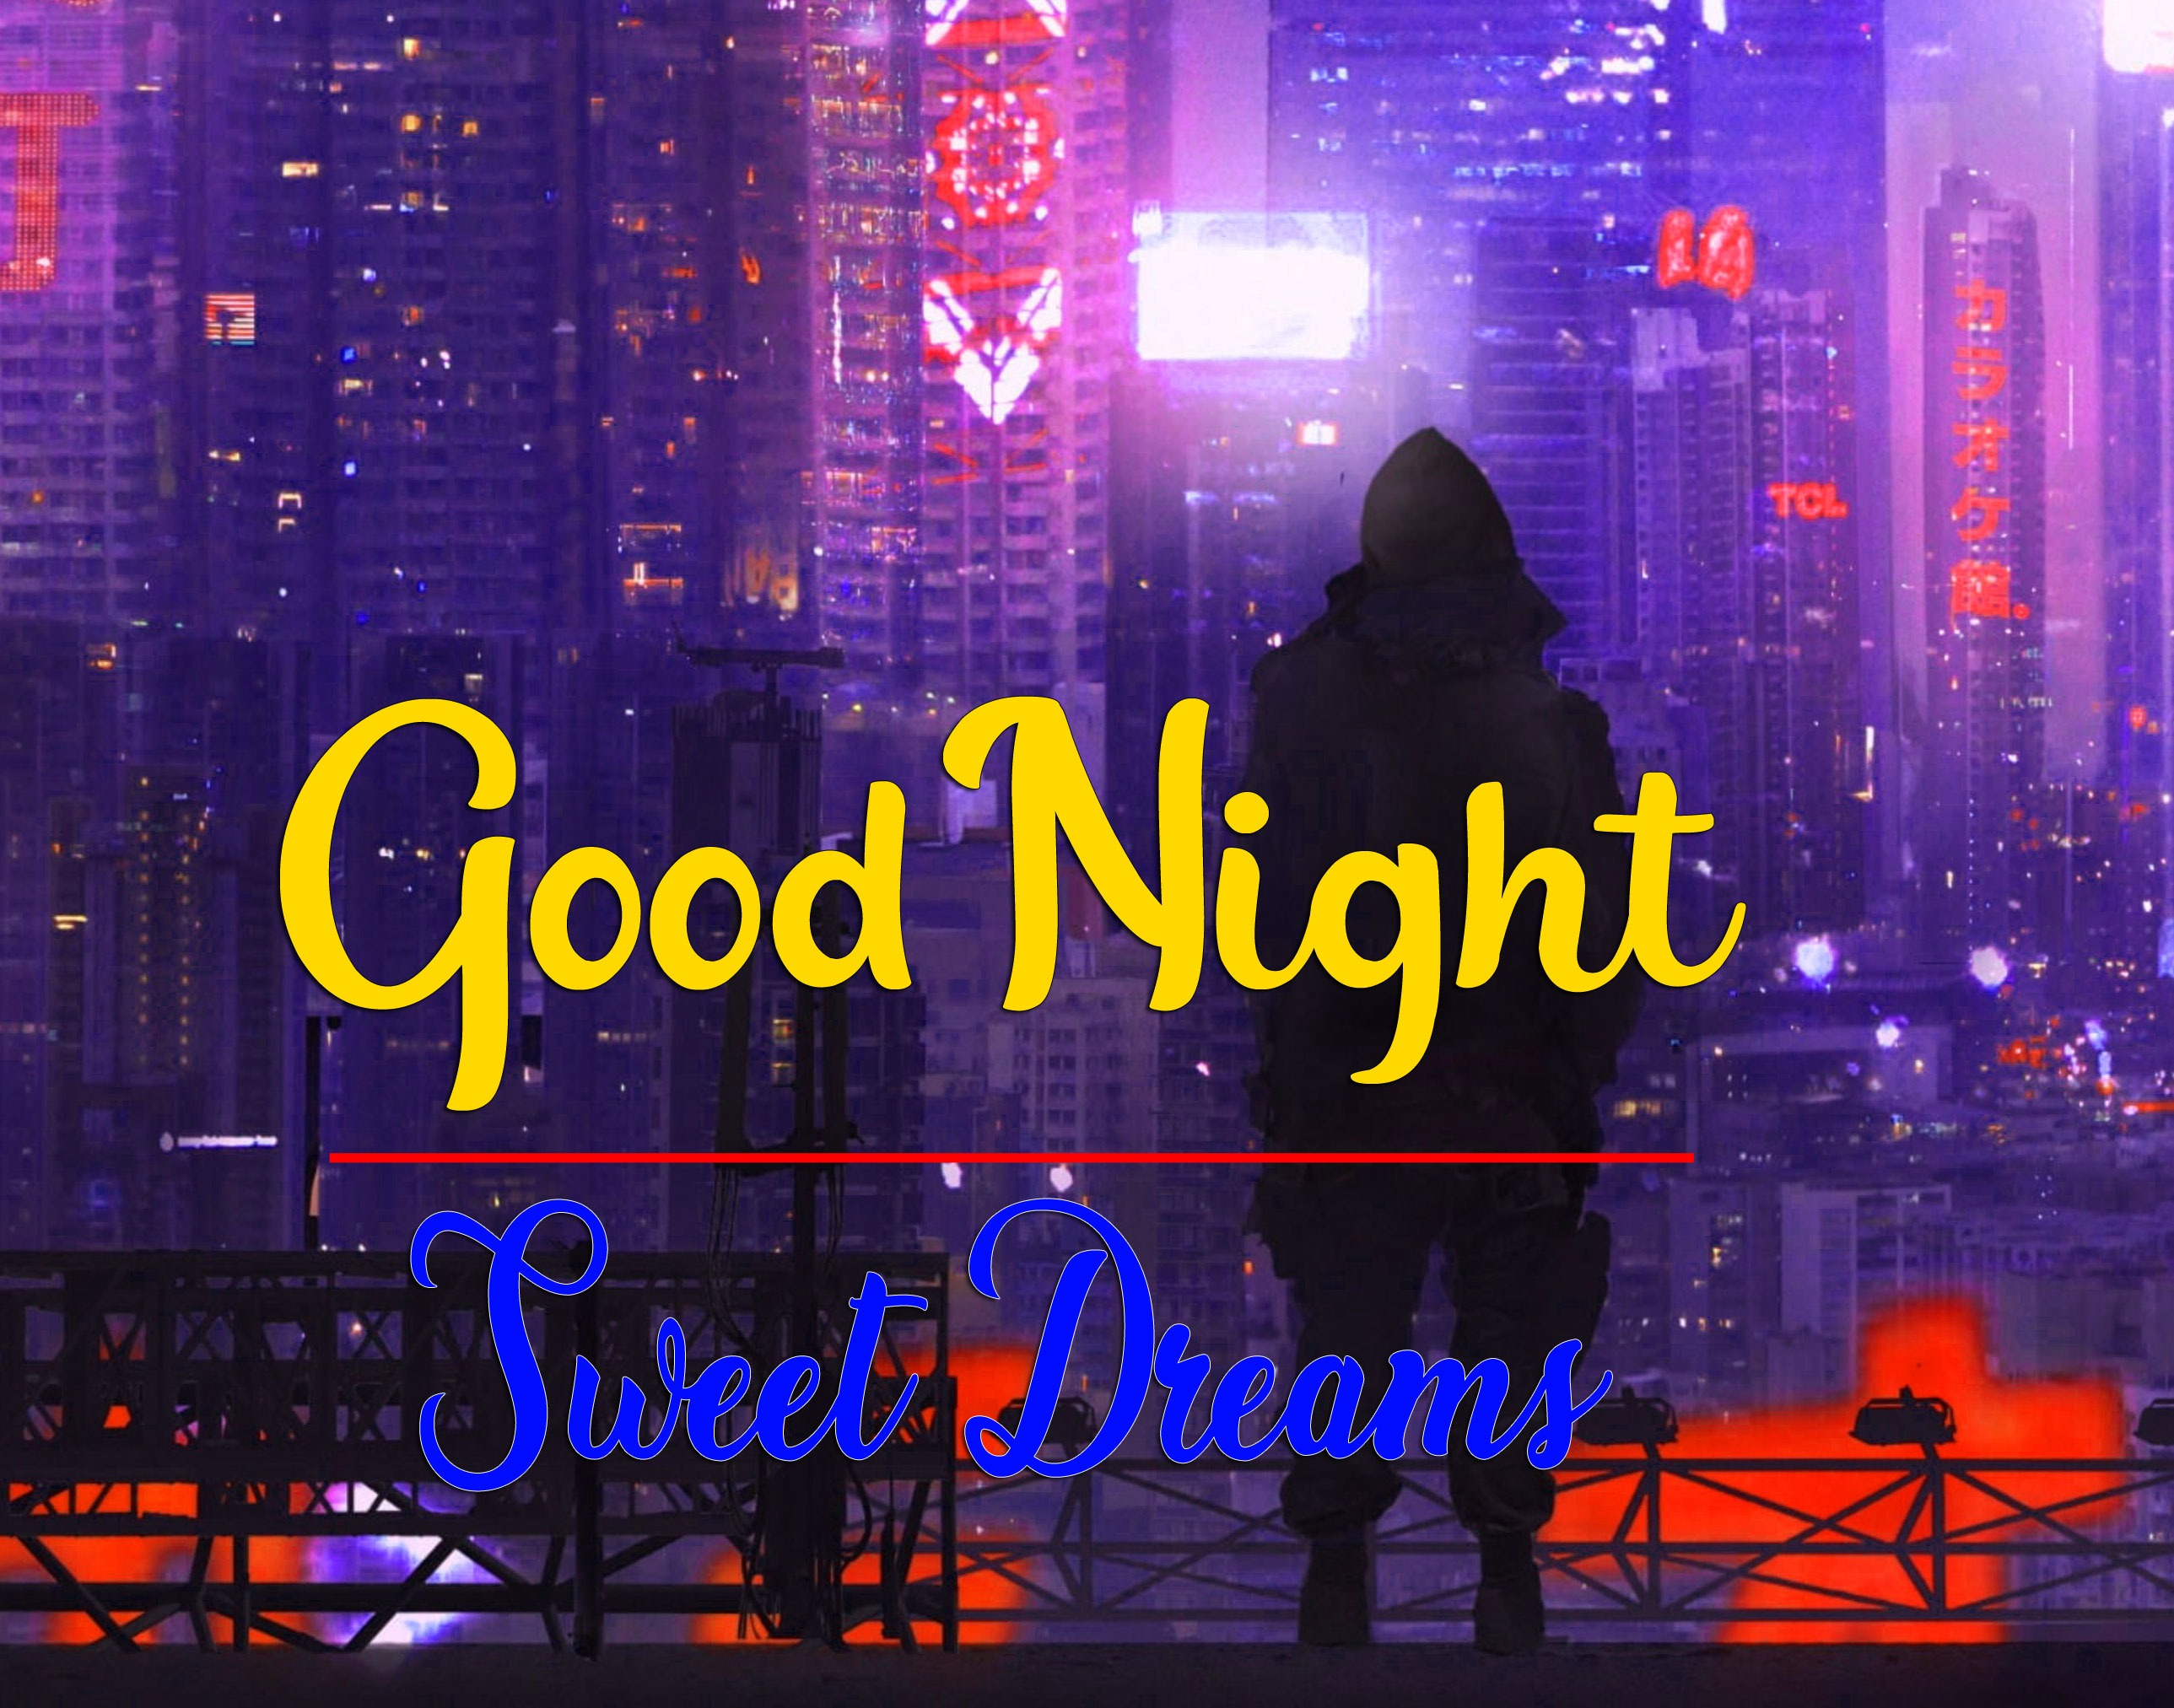 HD Good Night Pics Images HD Download